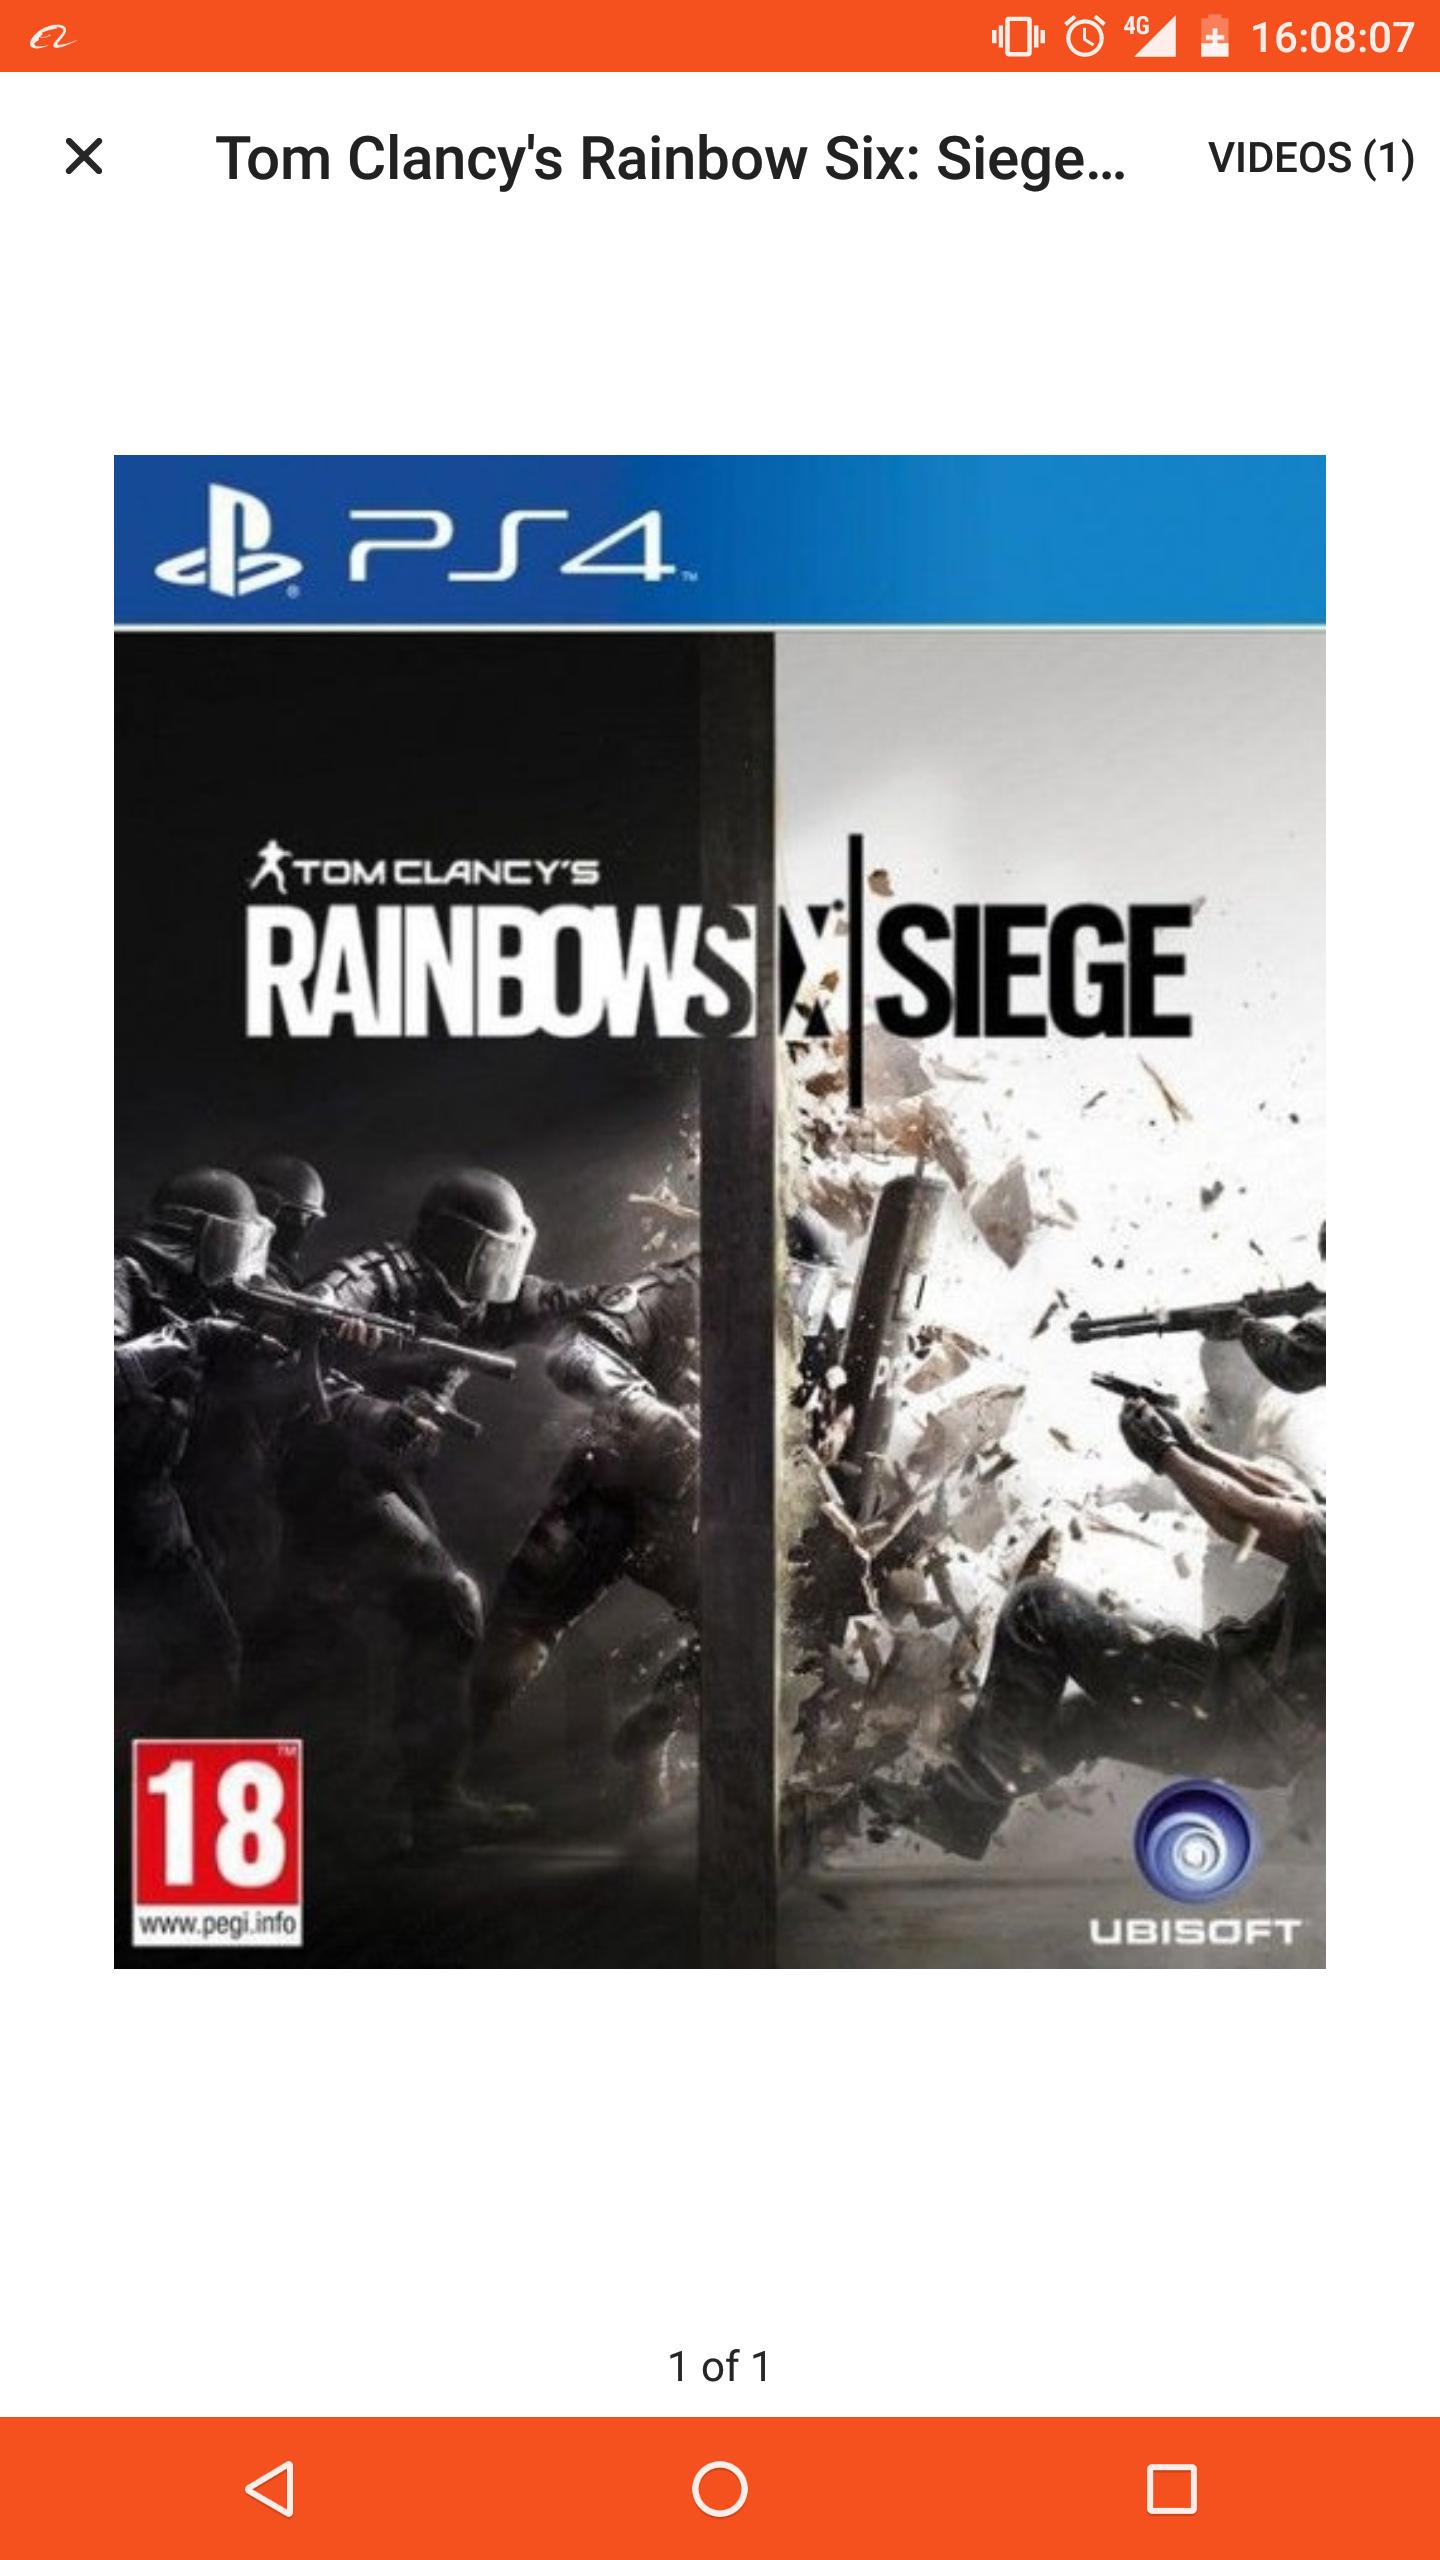 Rainbow Six Siege [PS4/X1] £14.99 (Prime / £16.98 non Prime) @ Amazon